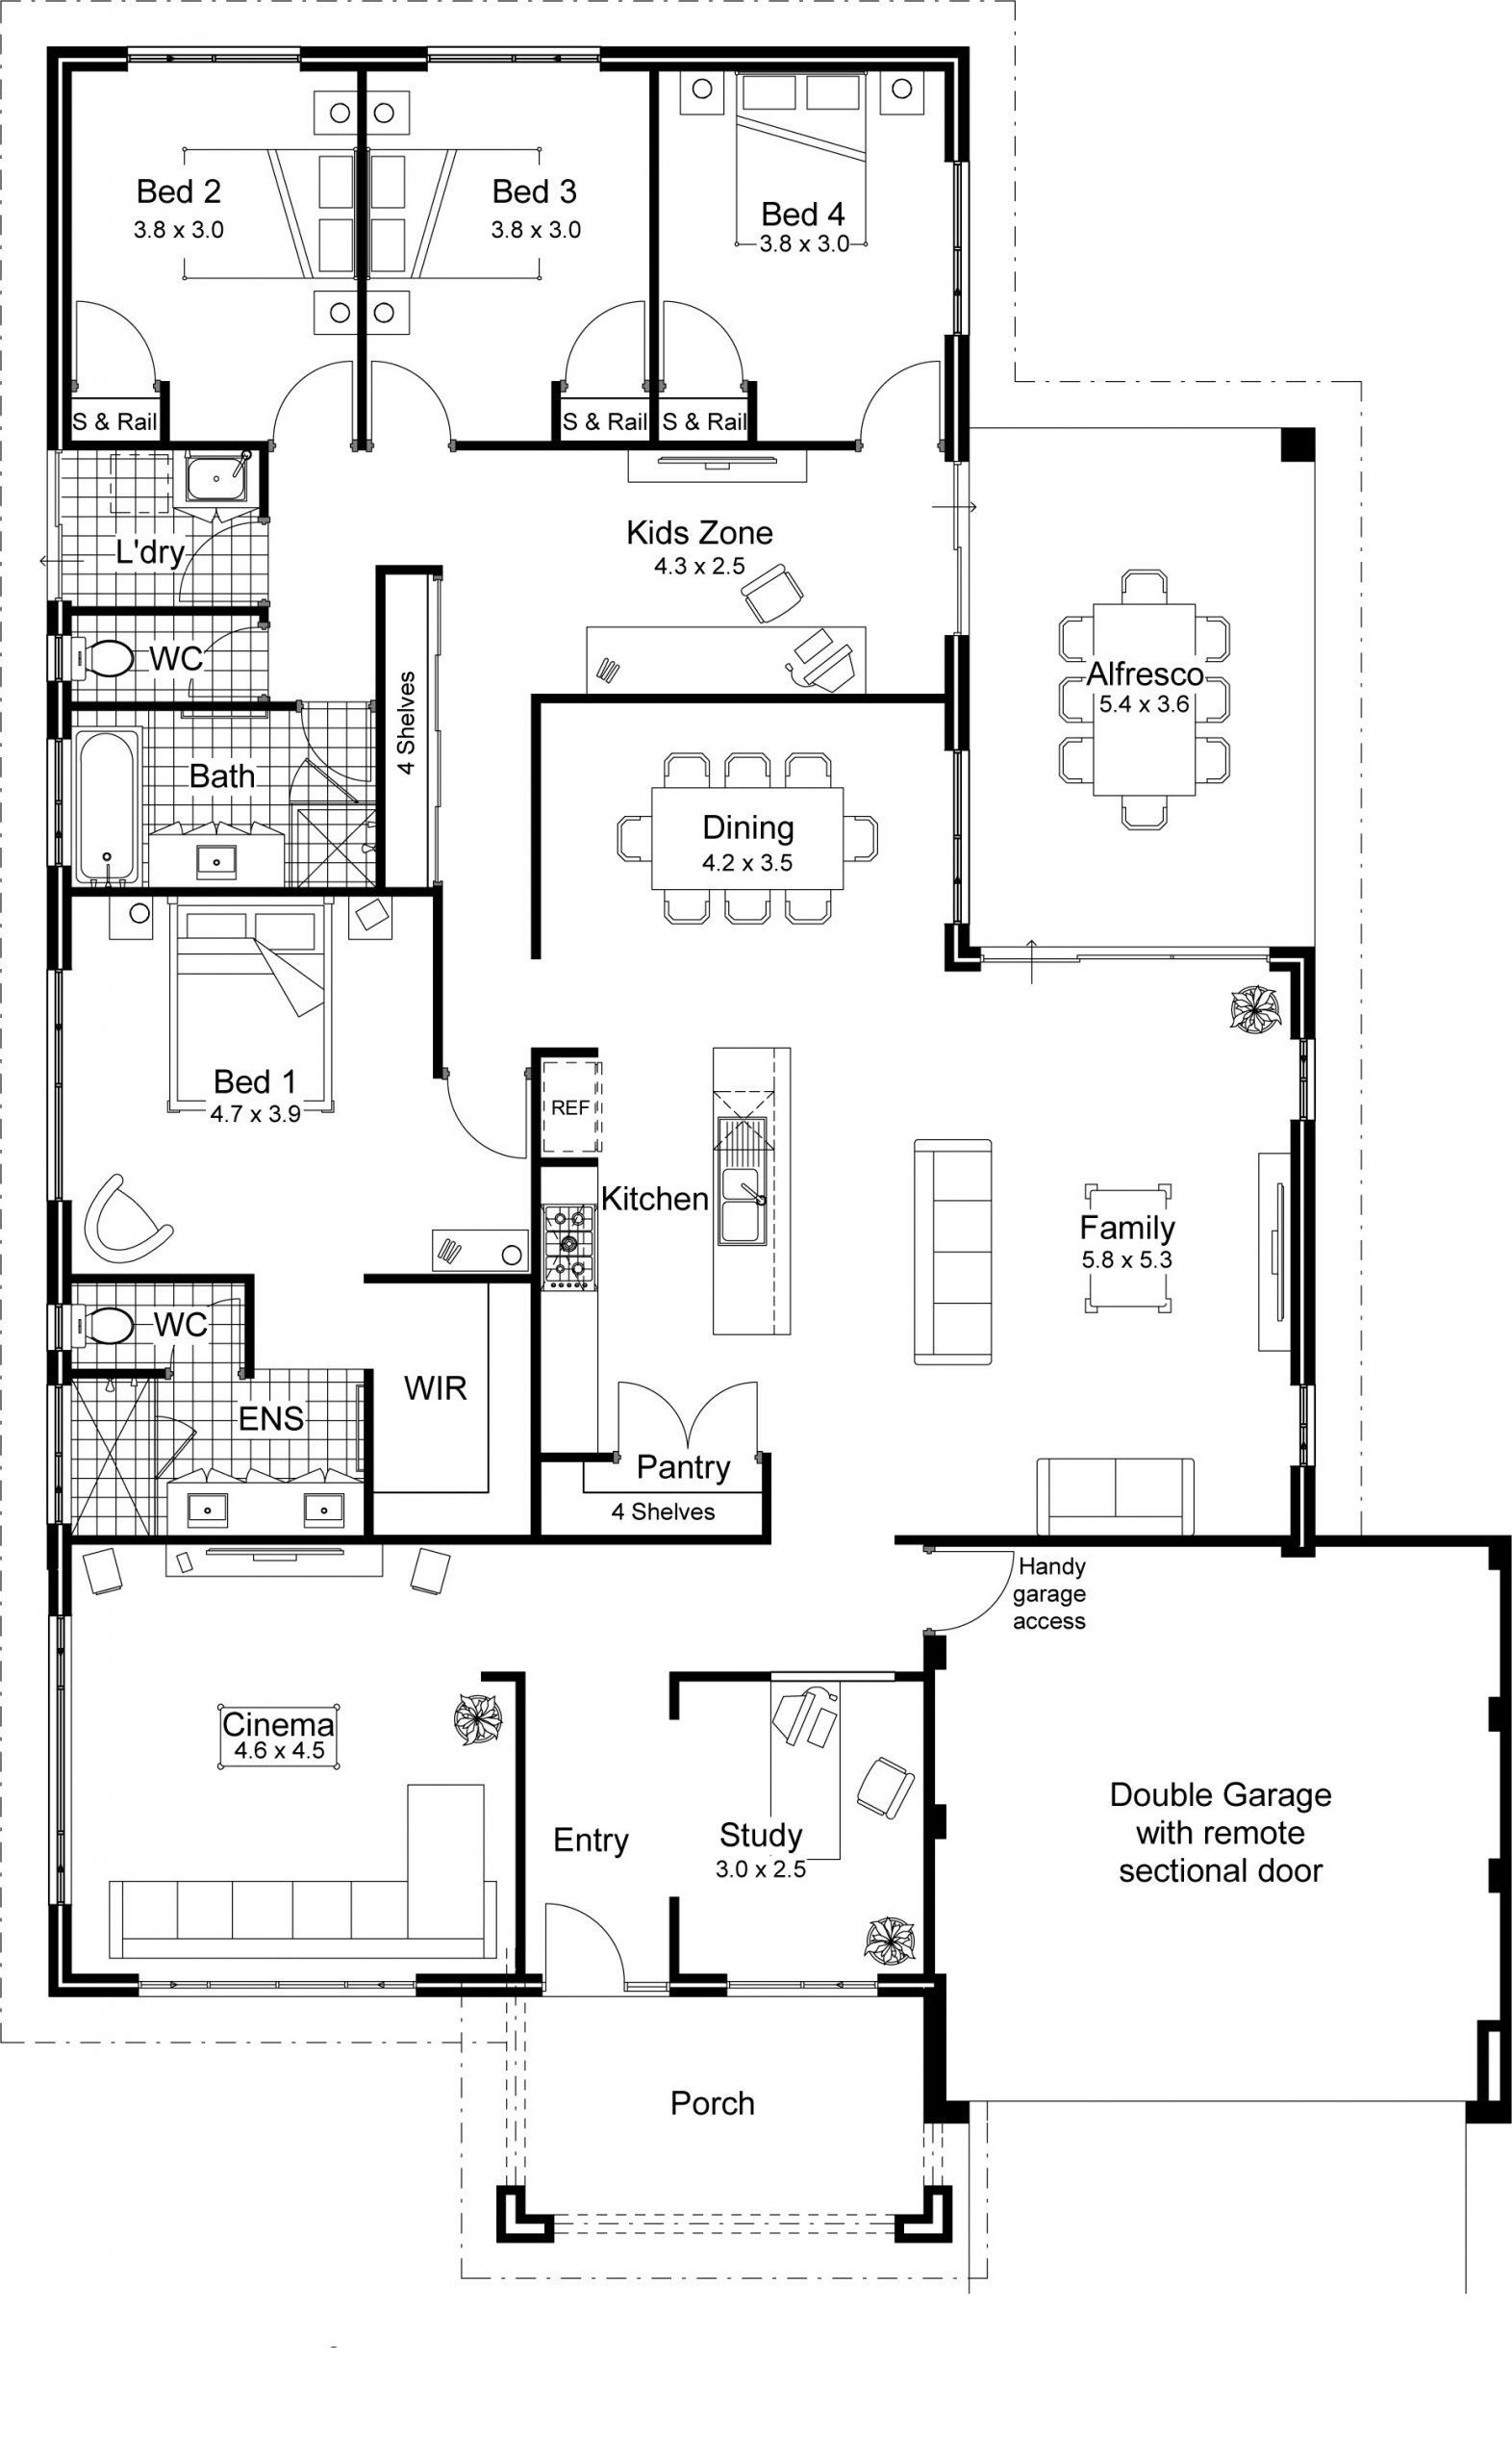 Modern House Designs Floor Plans Best House Plans Open Floor Plan Designs And Colors Modern Modern Floor Plans Open Concept House Plans Open Floor House Plans